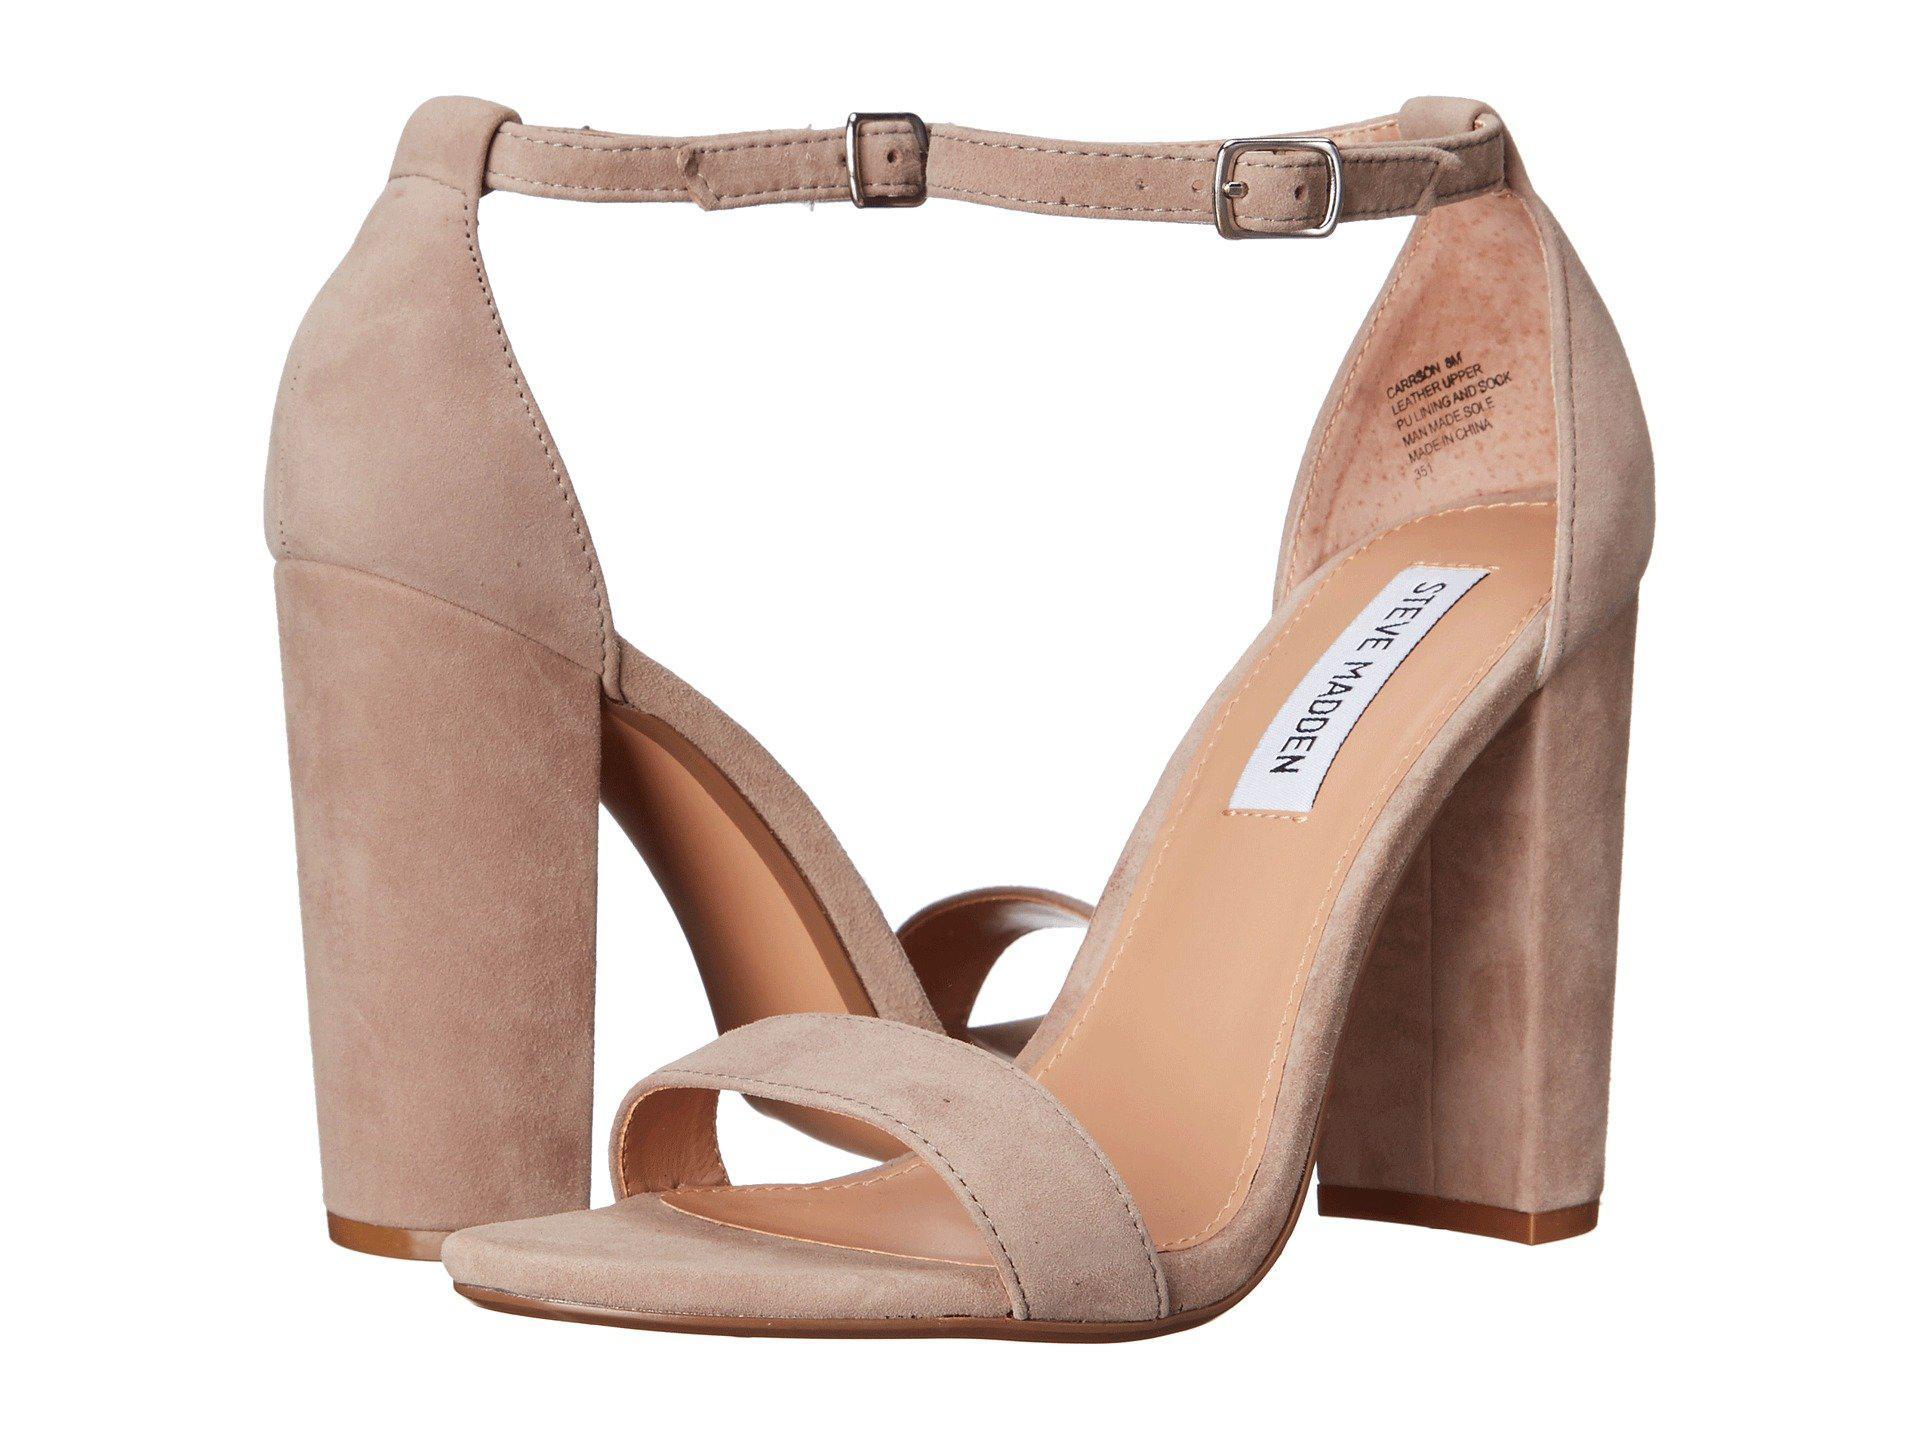 5642e12d0c5 Lyst - Steve Madden Carrson Heeled Sandal (black Suede) High Heels